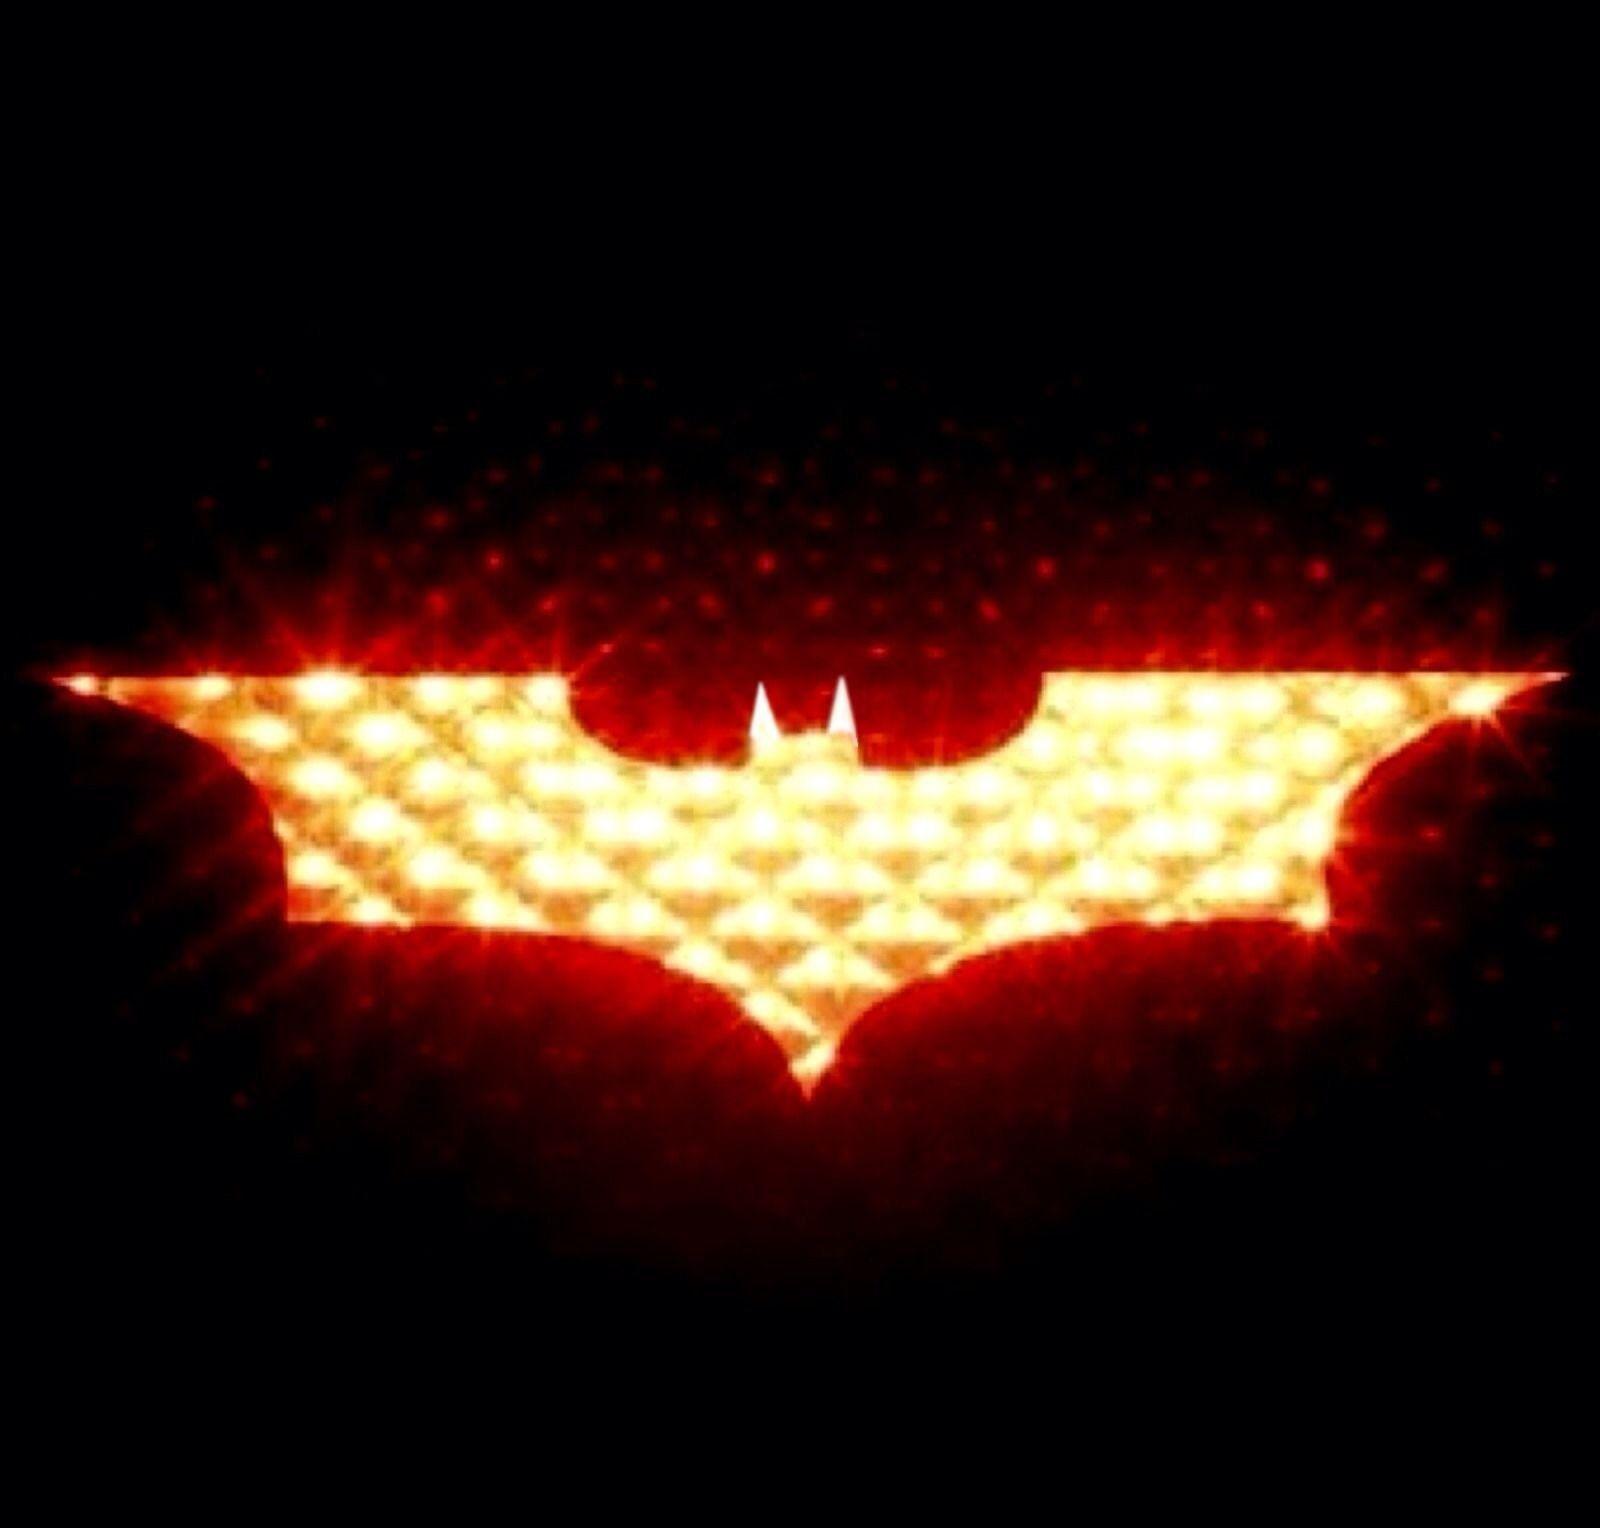 Batman 3rd Brakelight Decal Auto Car Sticker Vehicle Third Covering Mask Accesory Dark Knight Vinyl Decal Stickers Bat Automotive